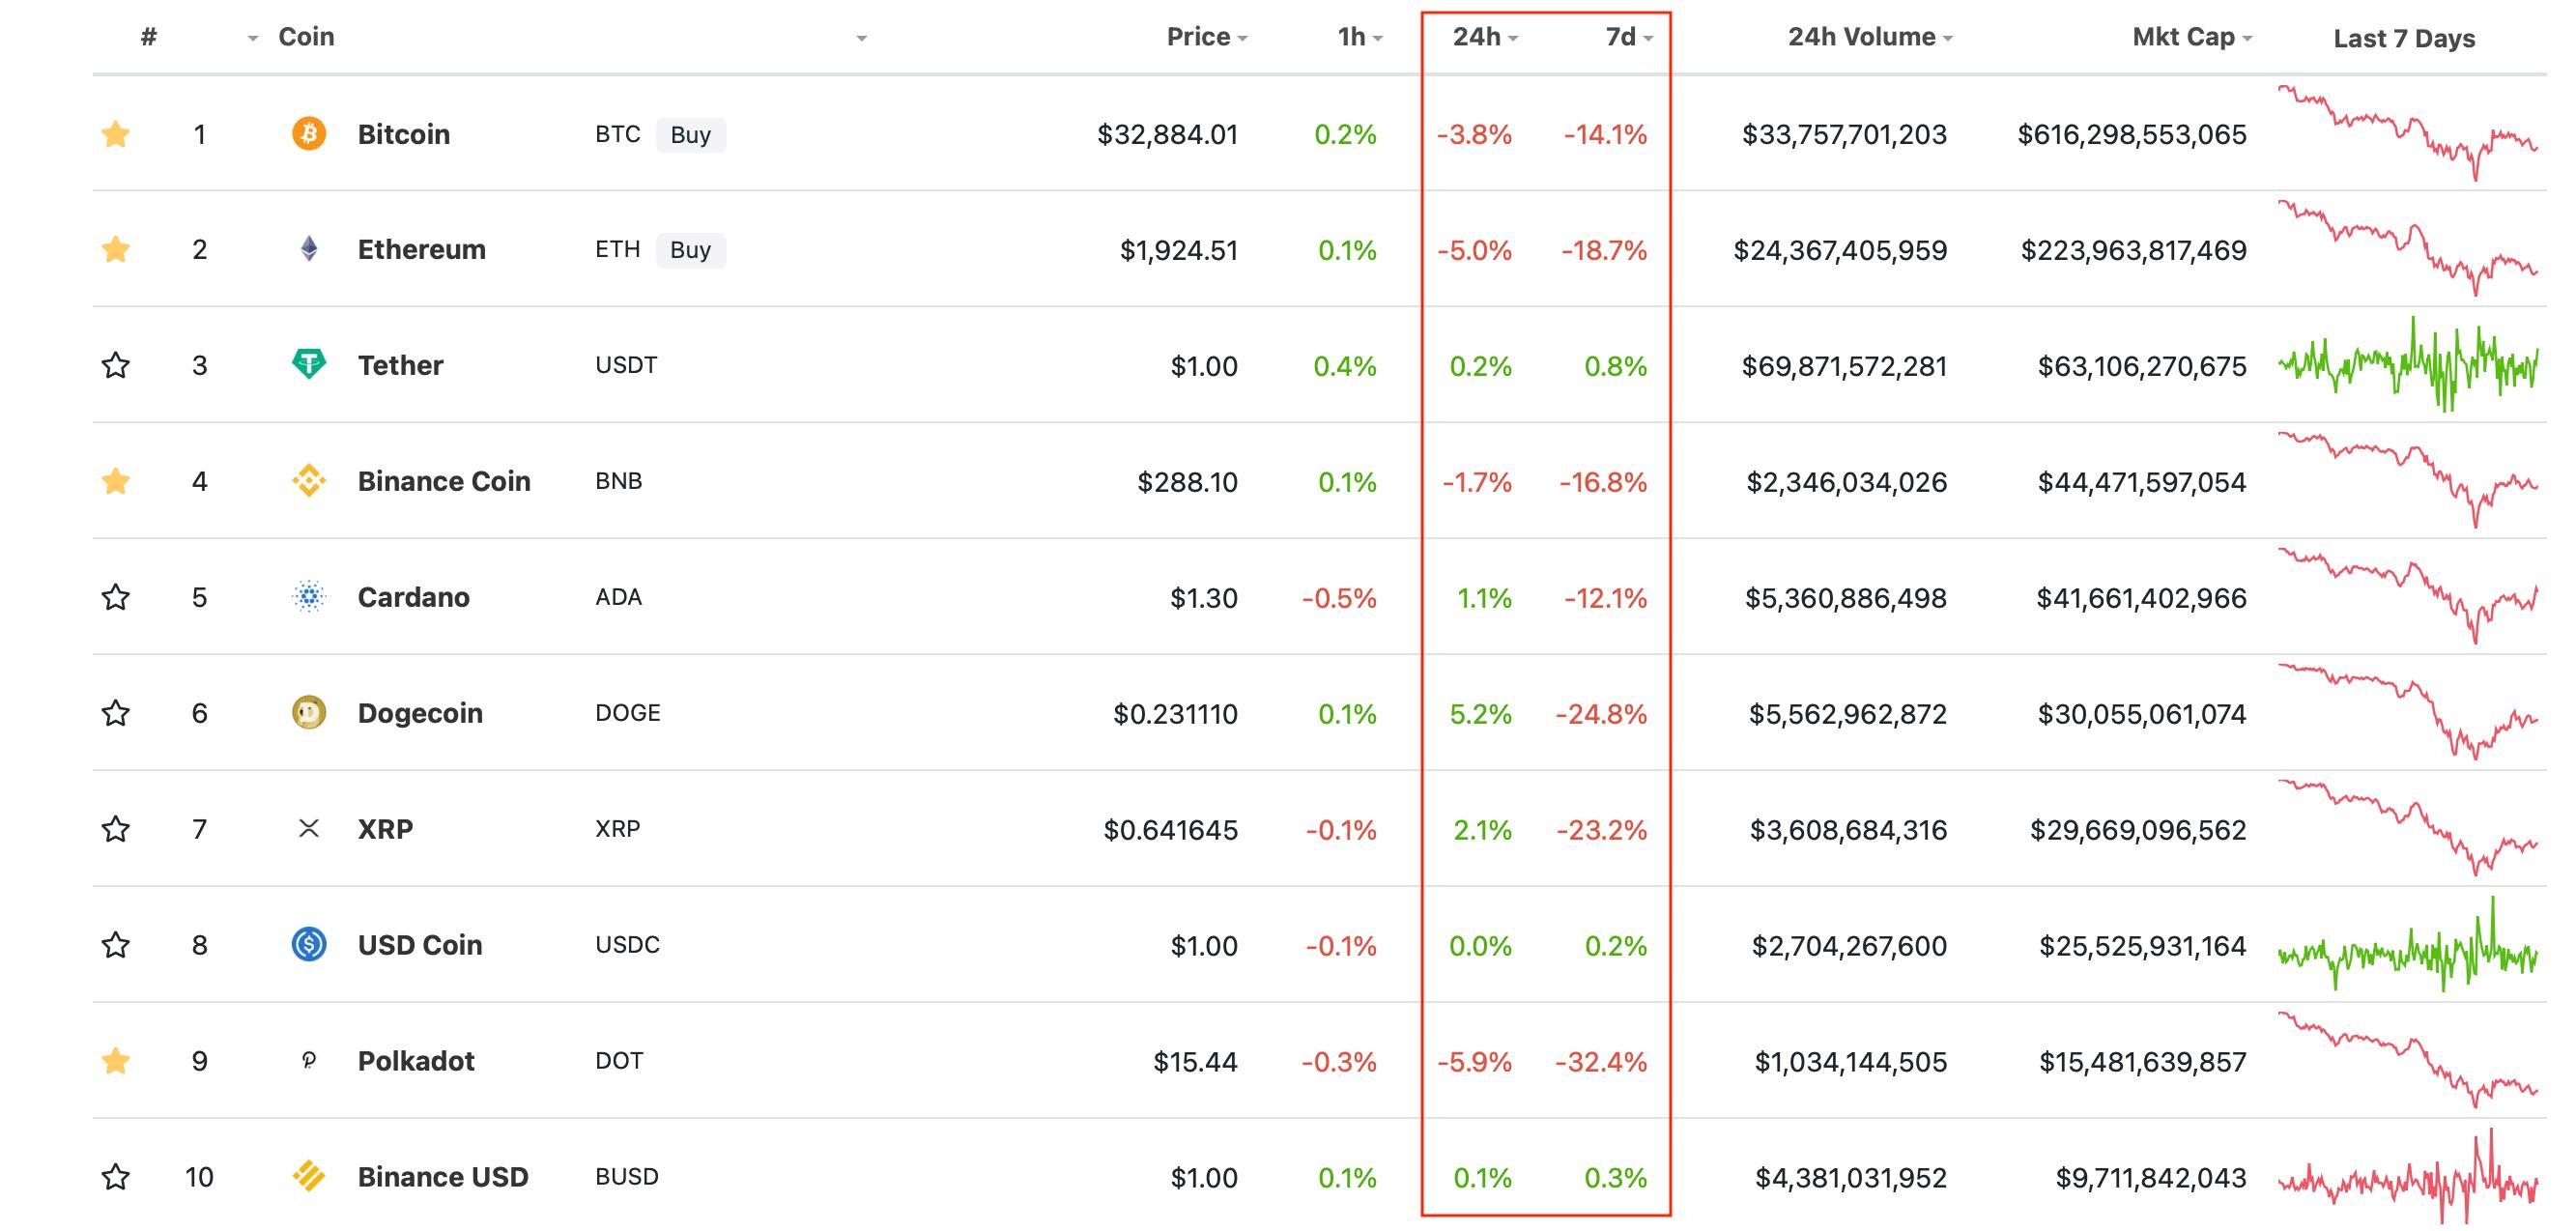 криптовалюты график курс топ